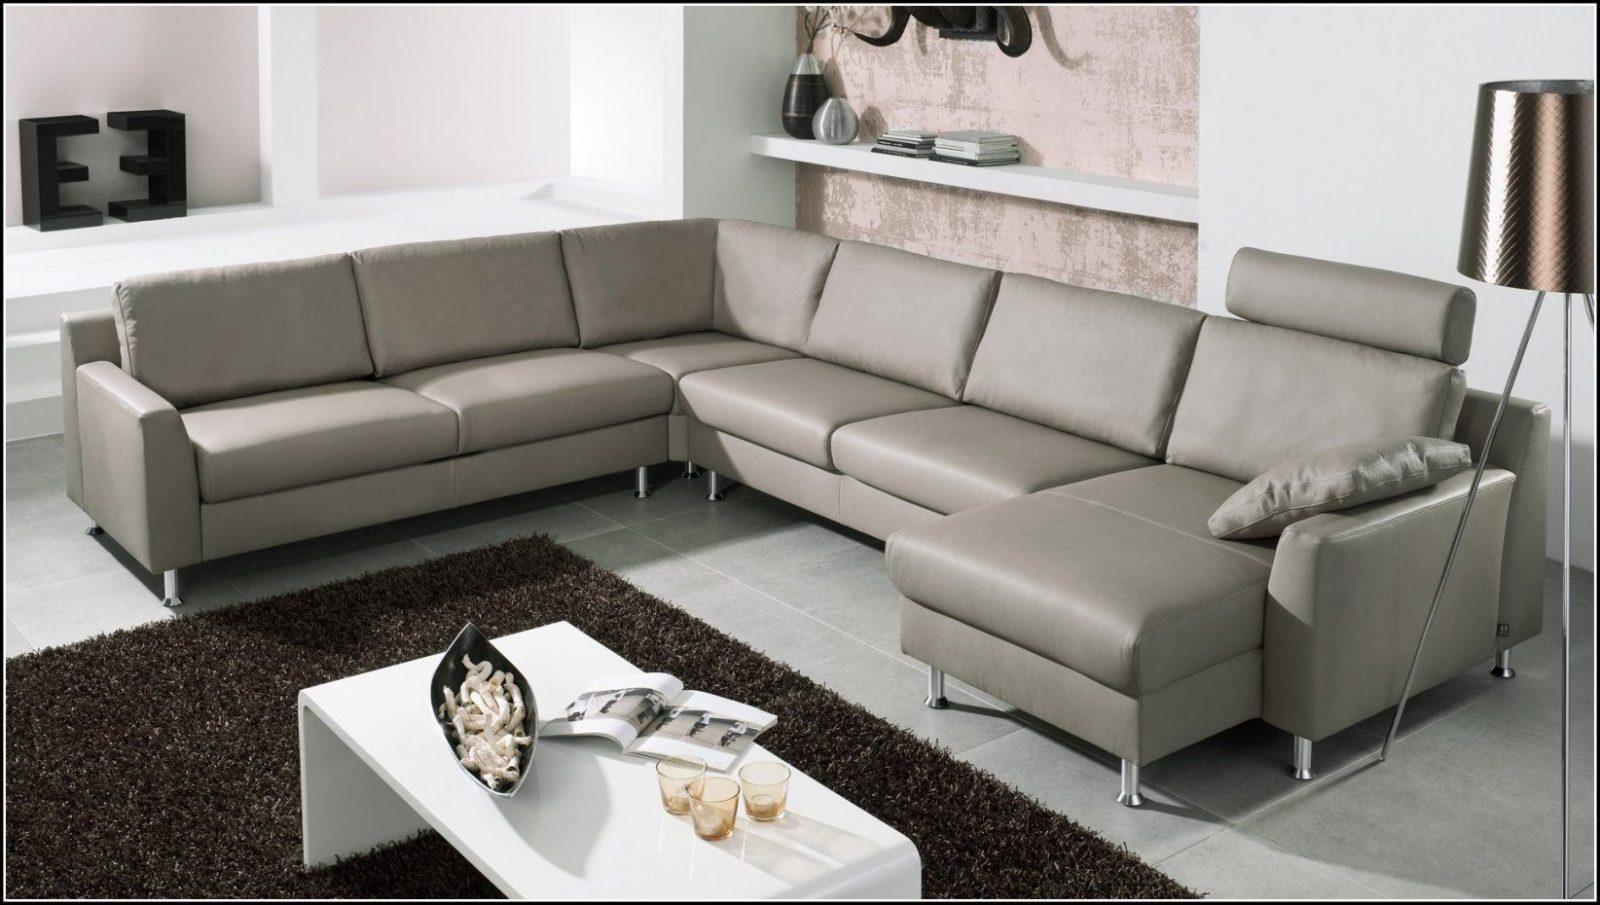 Sofa Ewald Schillig Flex Plus  Sofas  Hause Dekoration Bilder von Flex Plus Ewald Schillig Photo